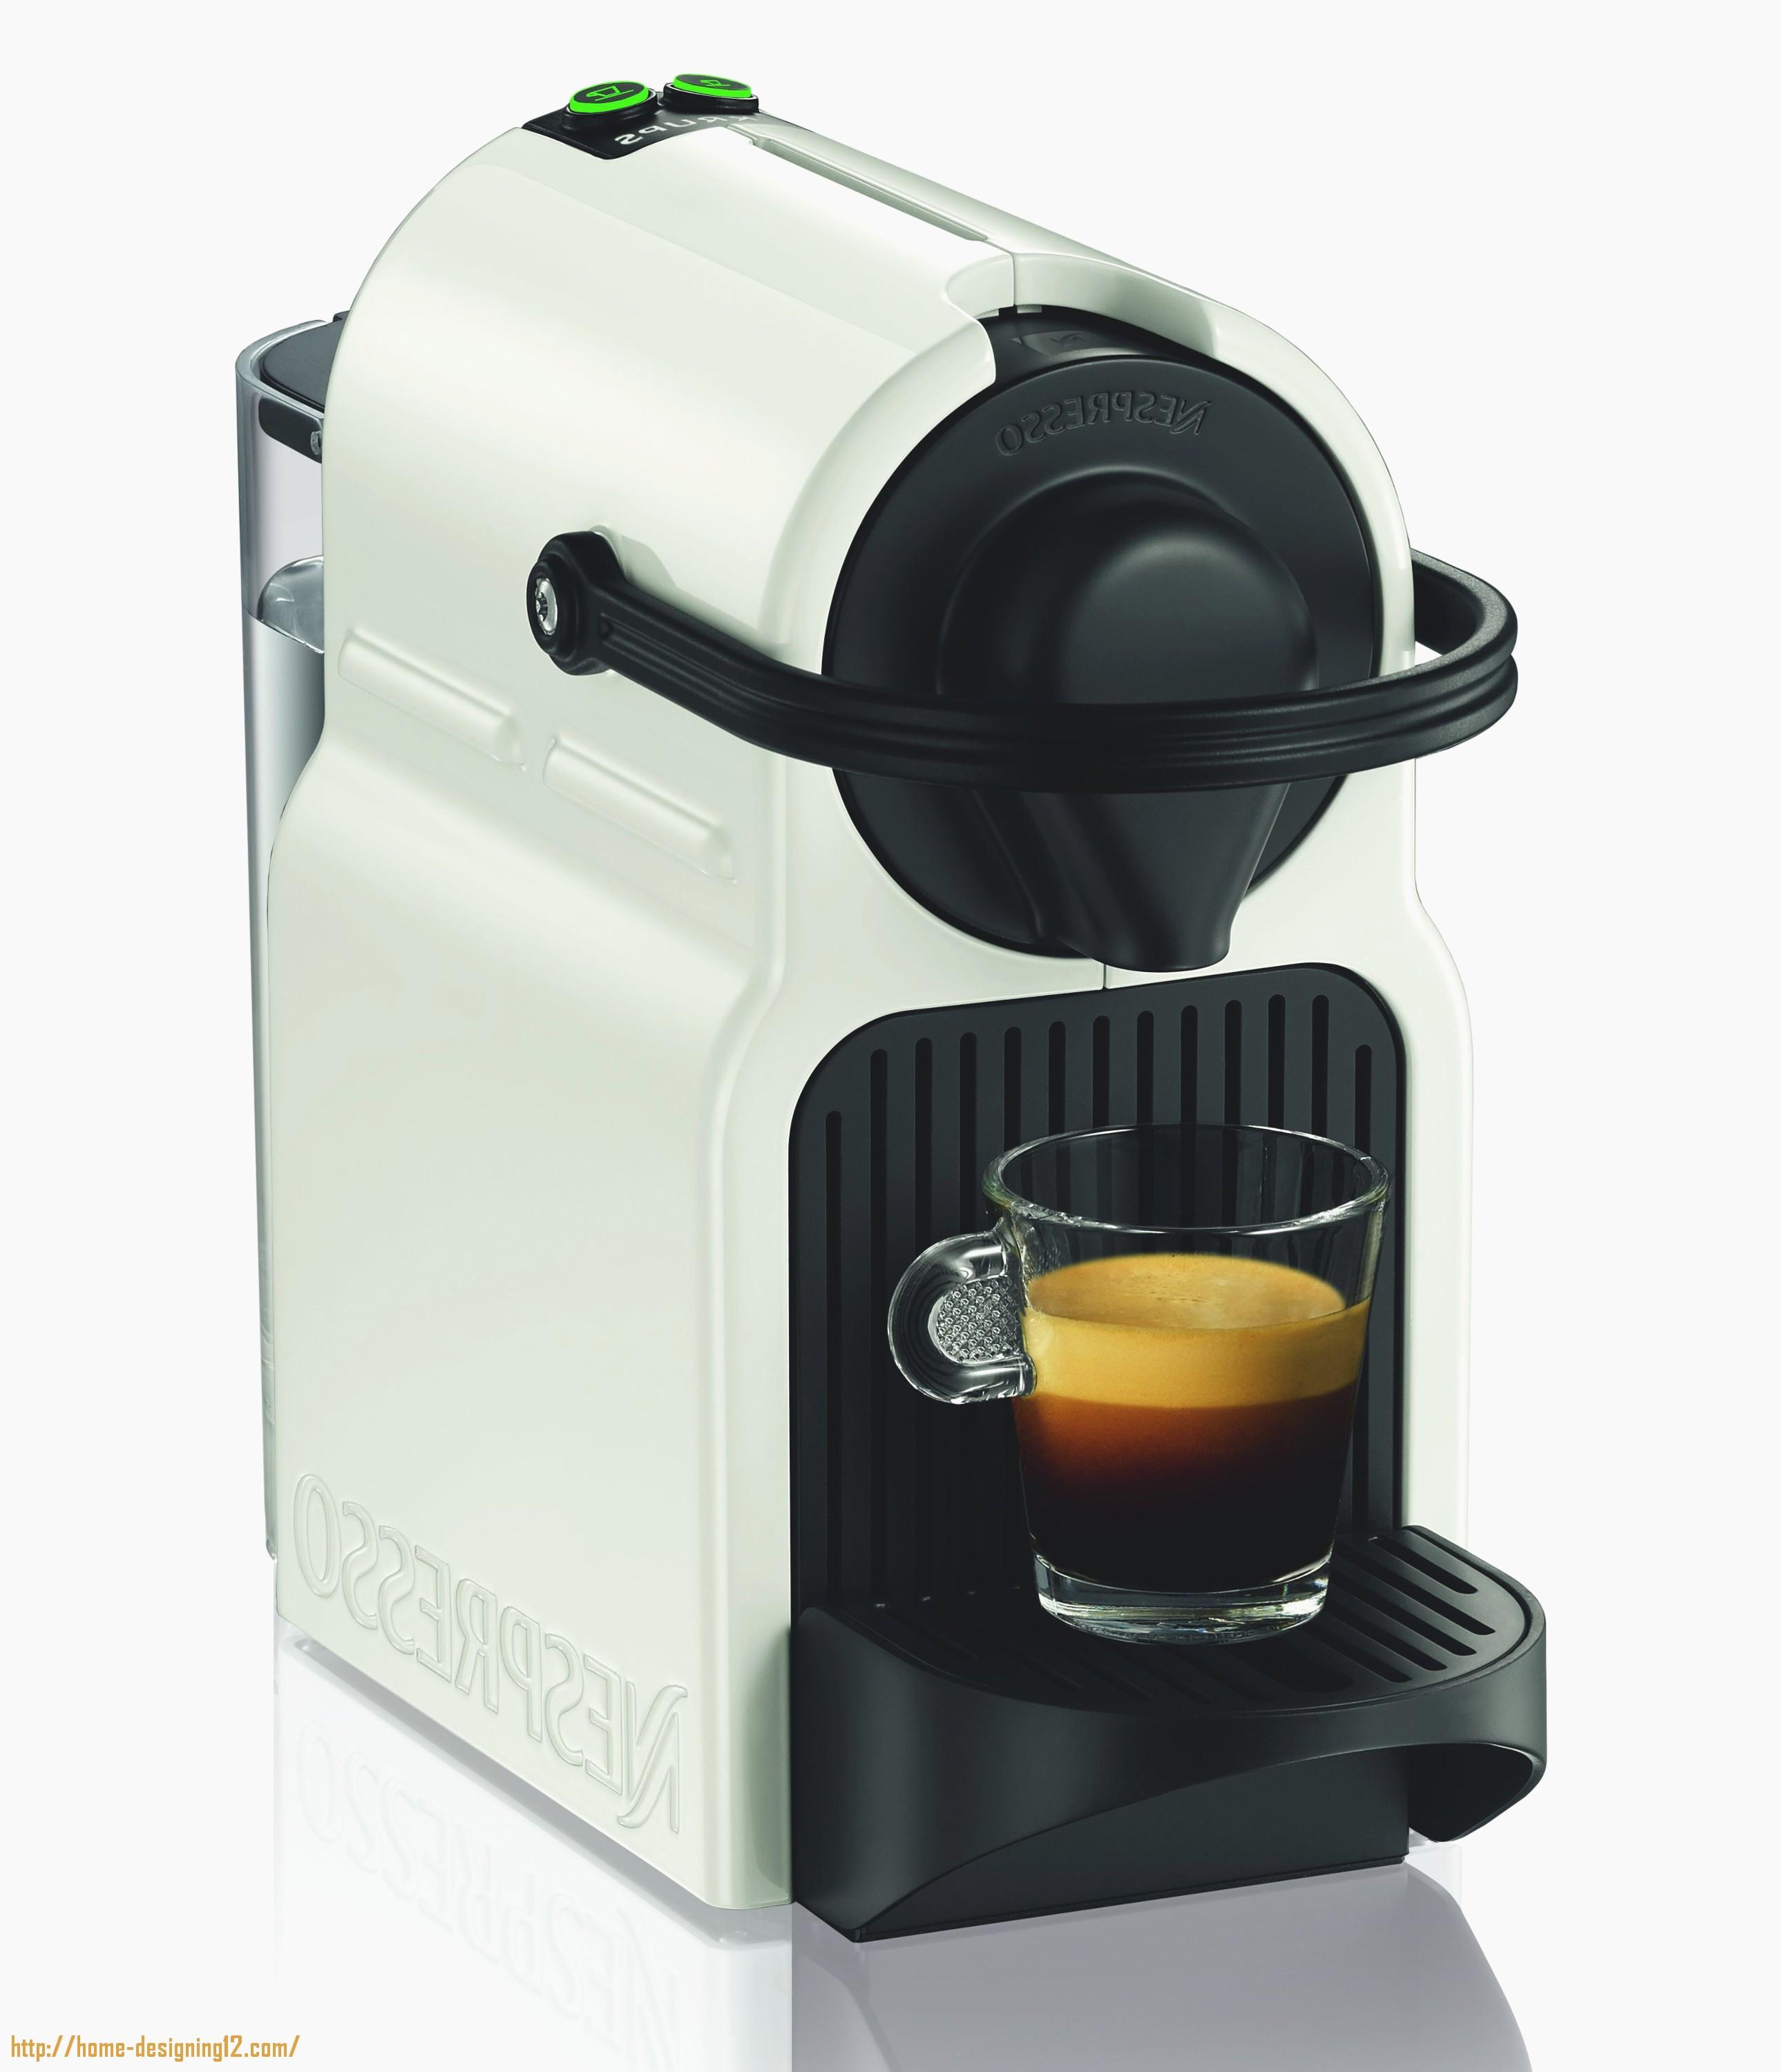 cafetiere nespresso d'occasion pas cher